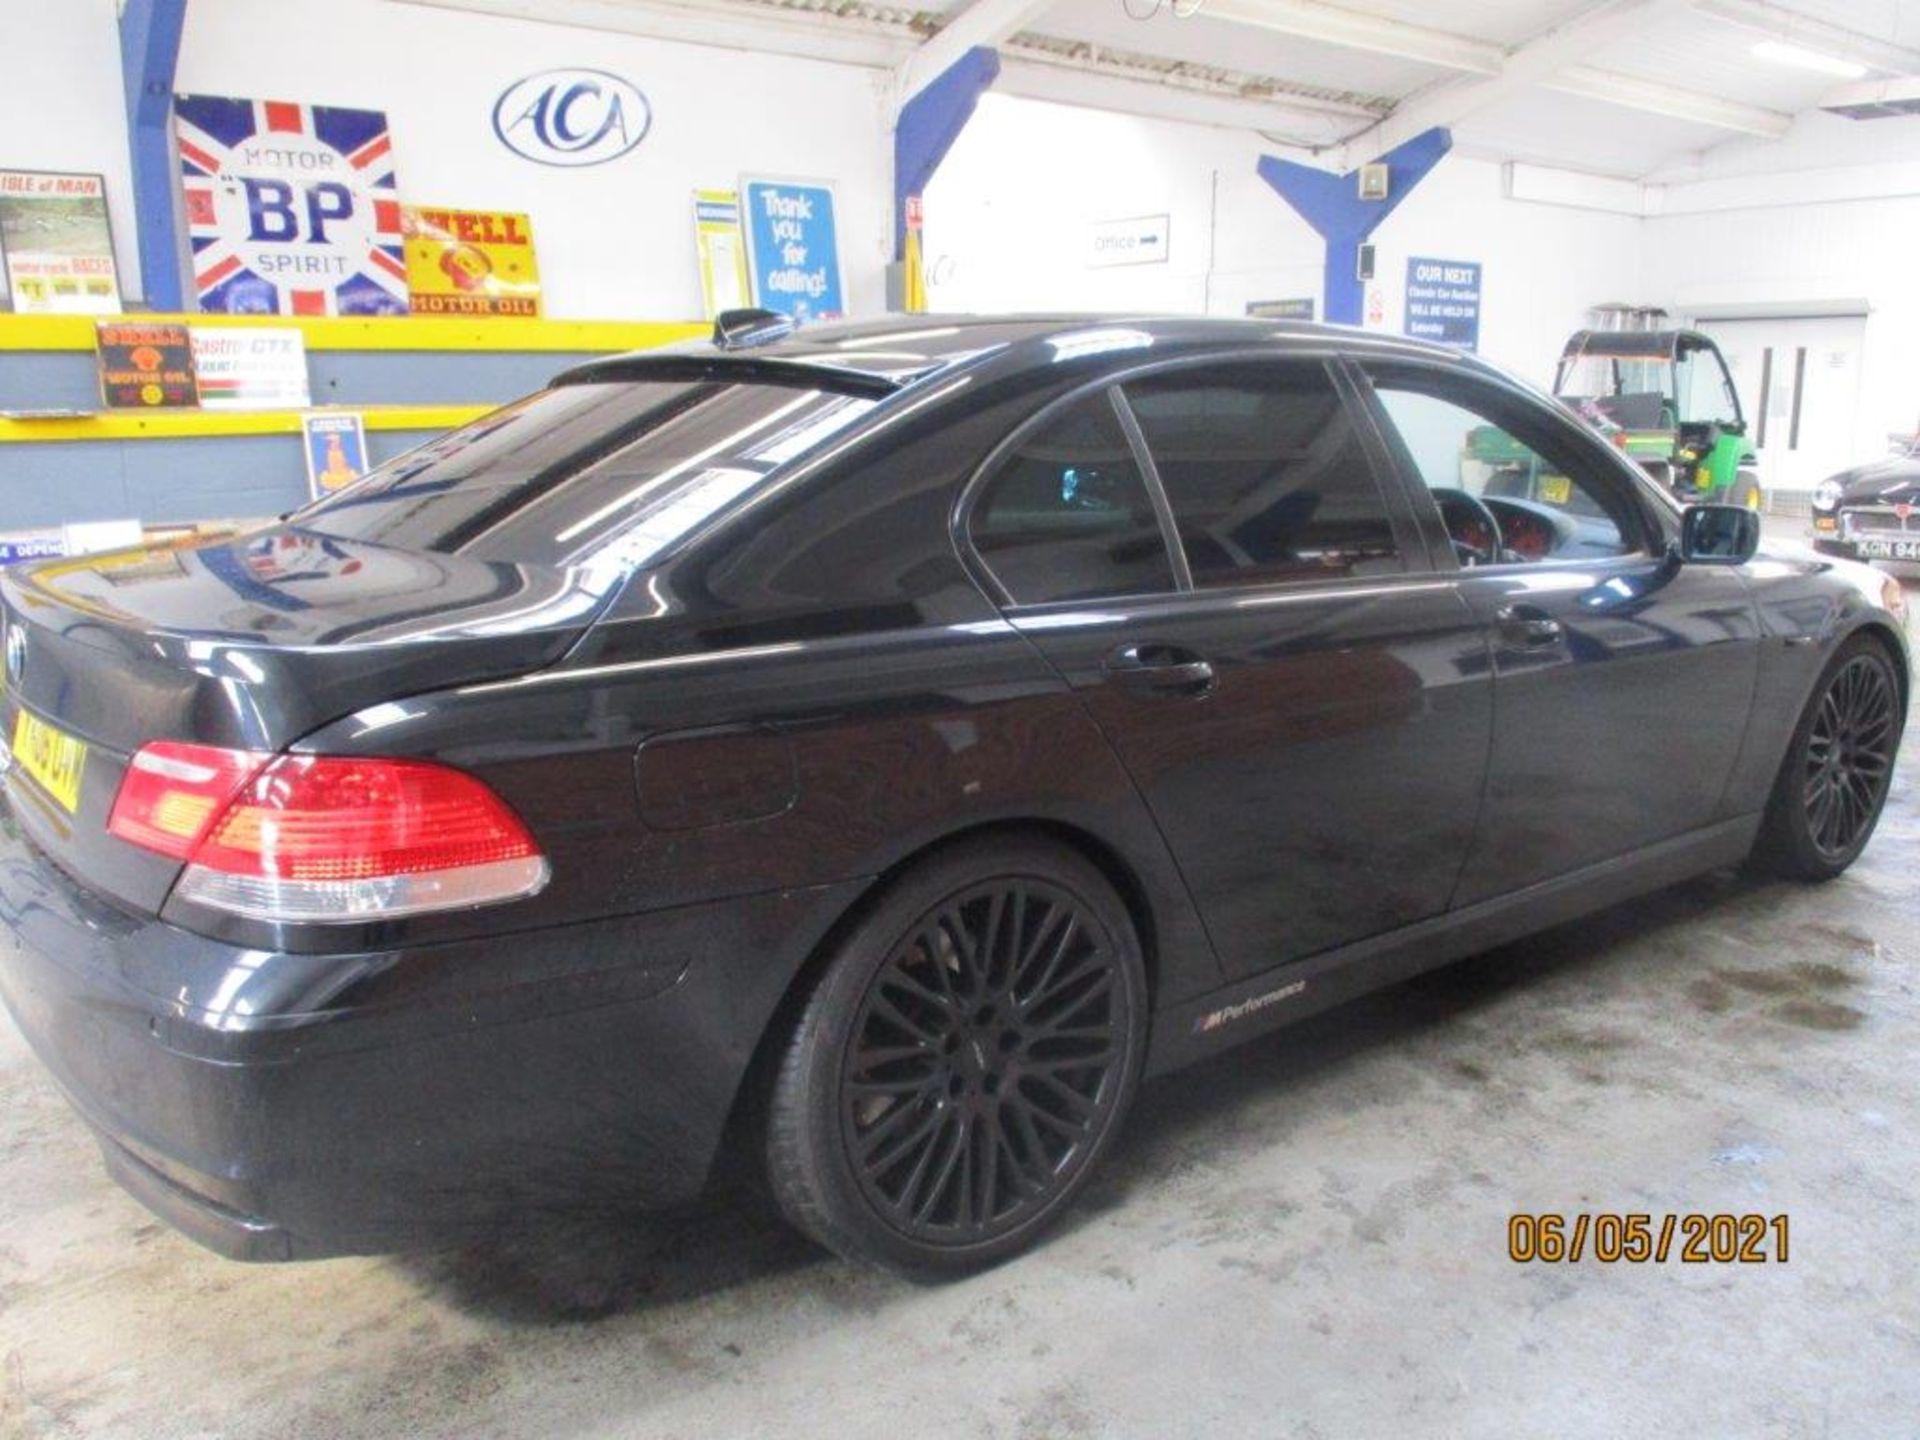 06 06 BMW 730 D Sport Auto - Image 4 of 23